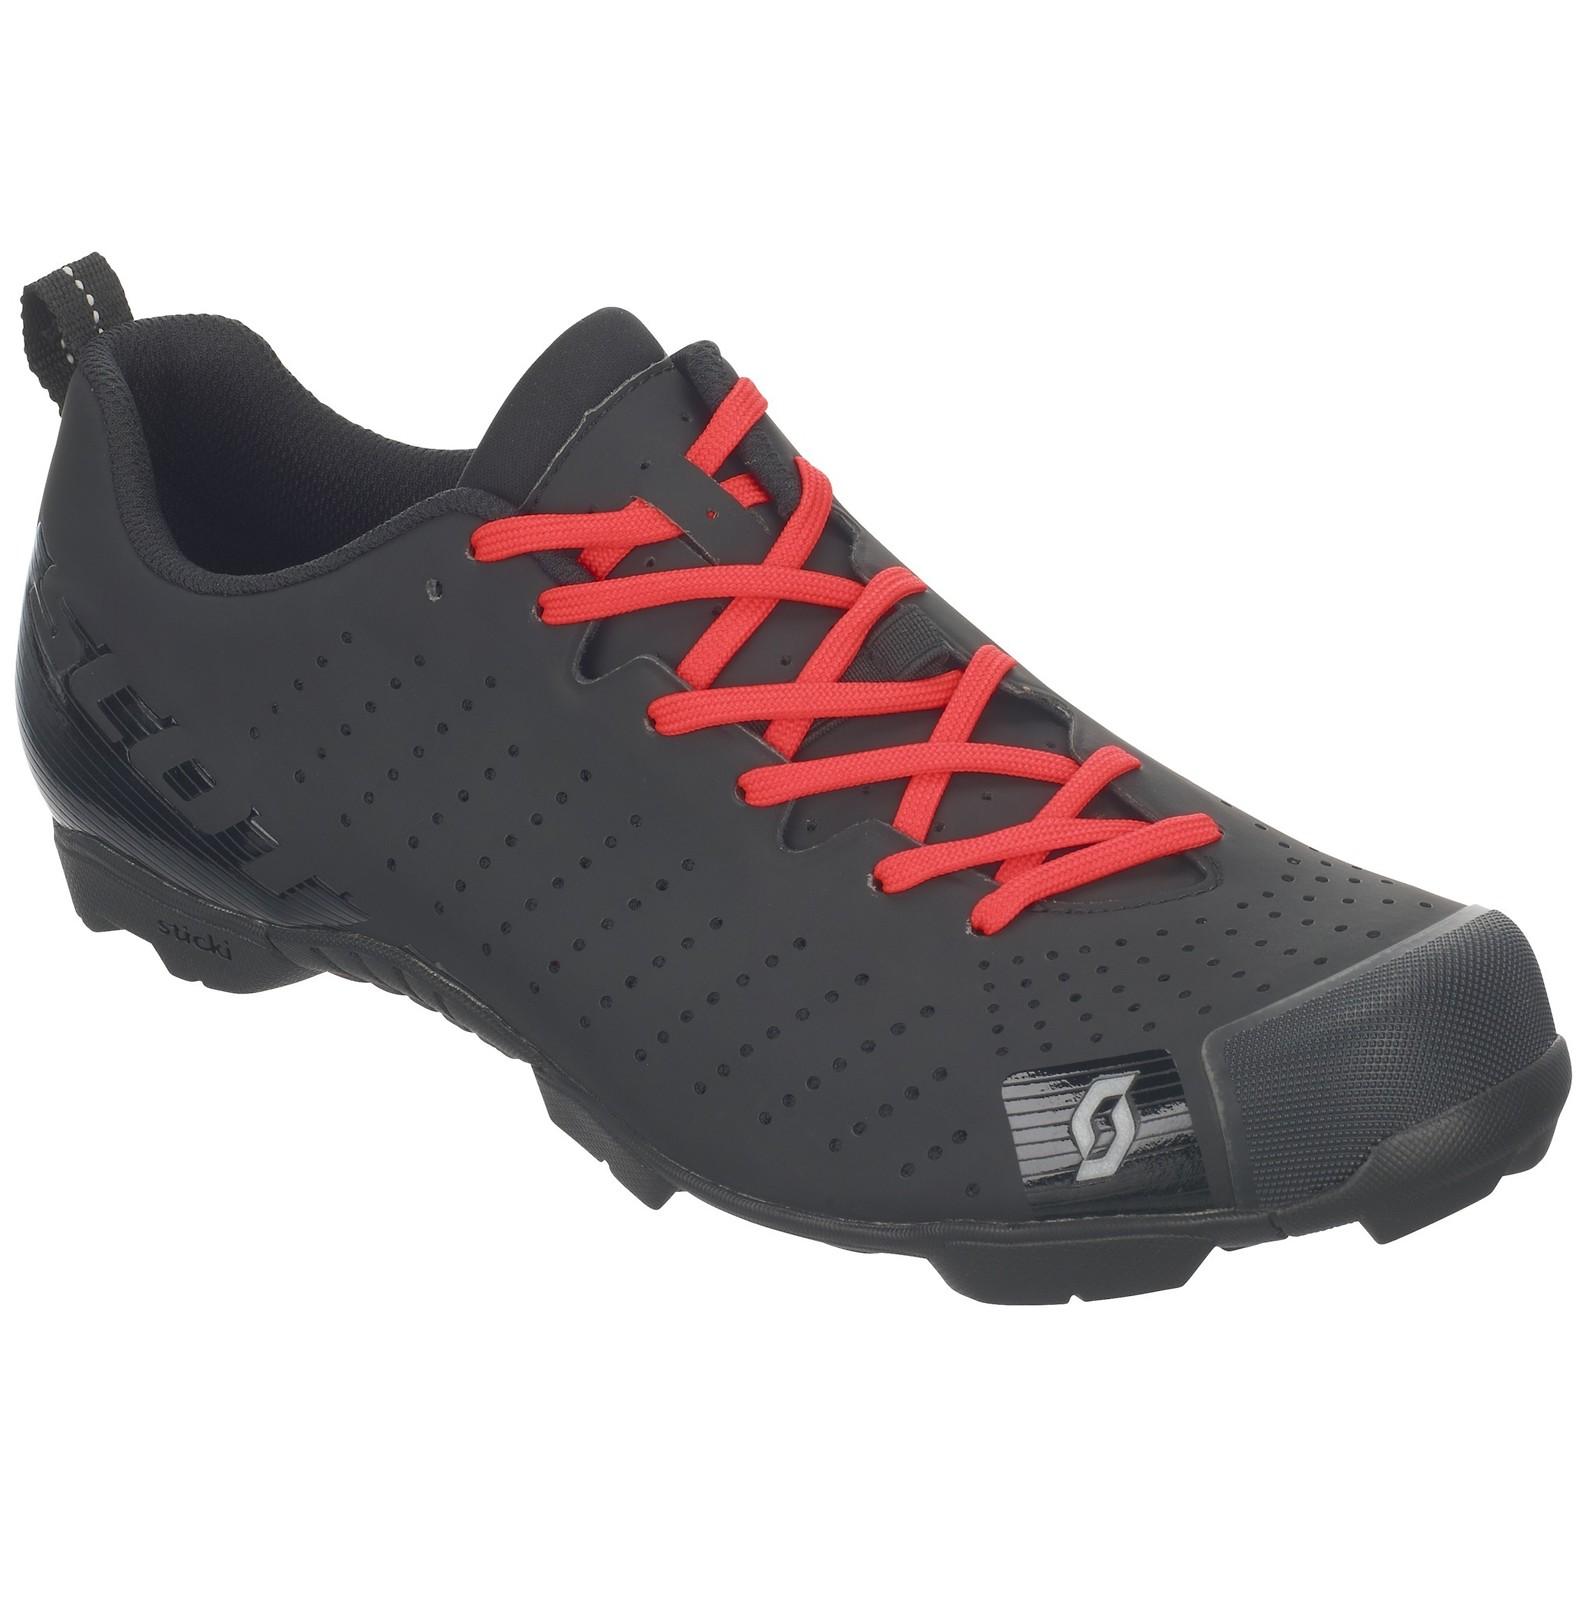 Scott RC Lace shoe in matte black/gloss black